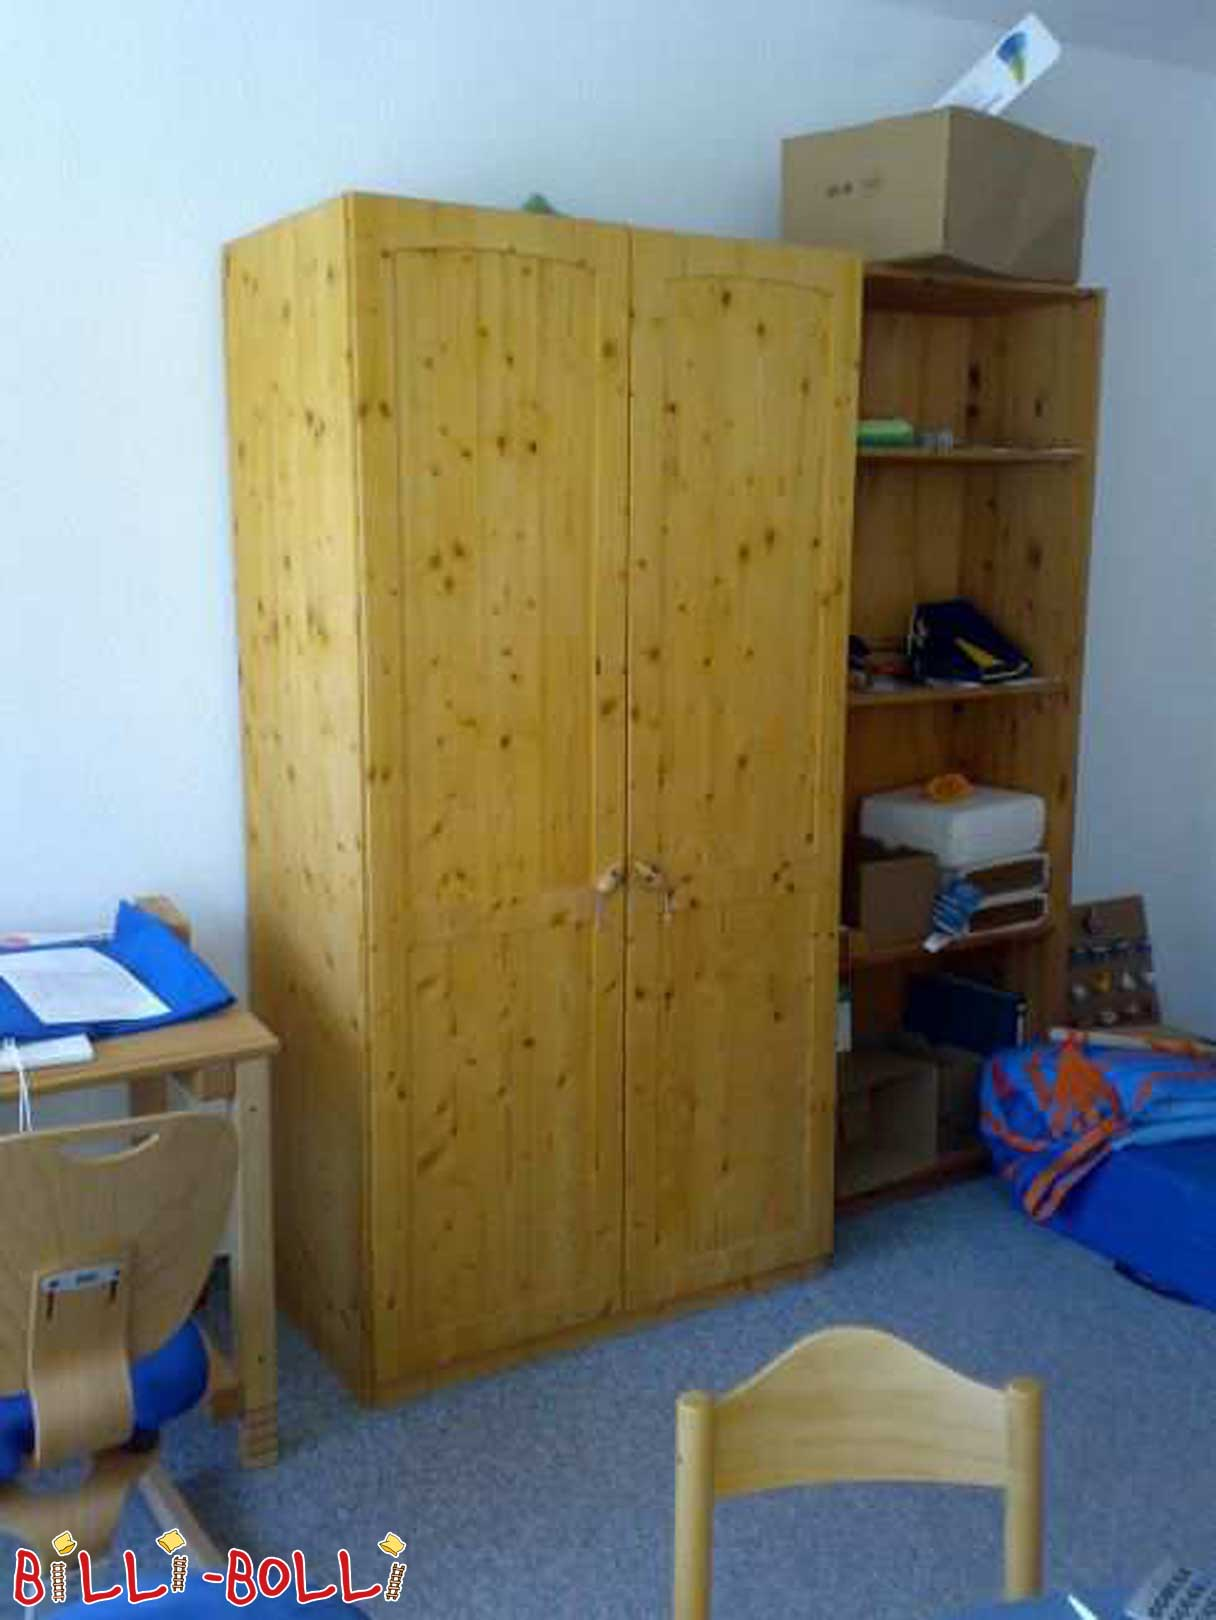 kleiderschrank kinderm bel gebraucht. Black Bedroom Furniture Sets. Home Design Ideas